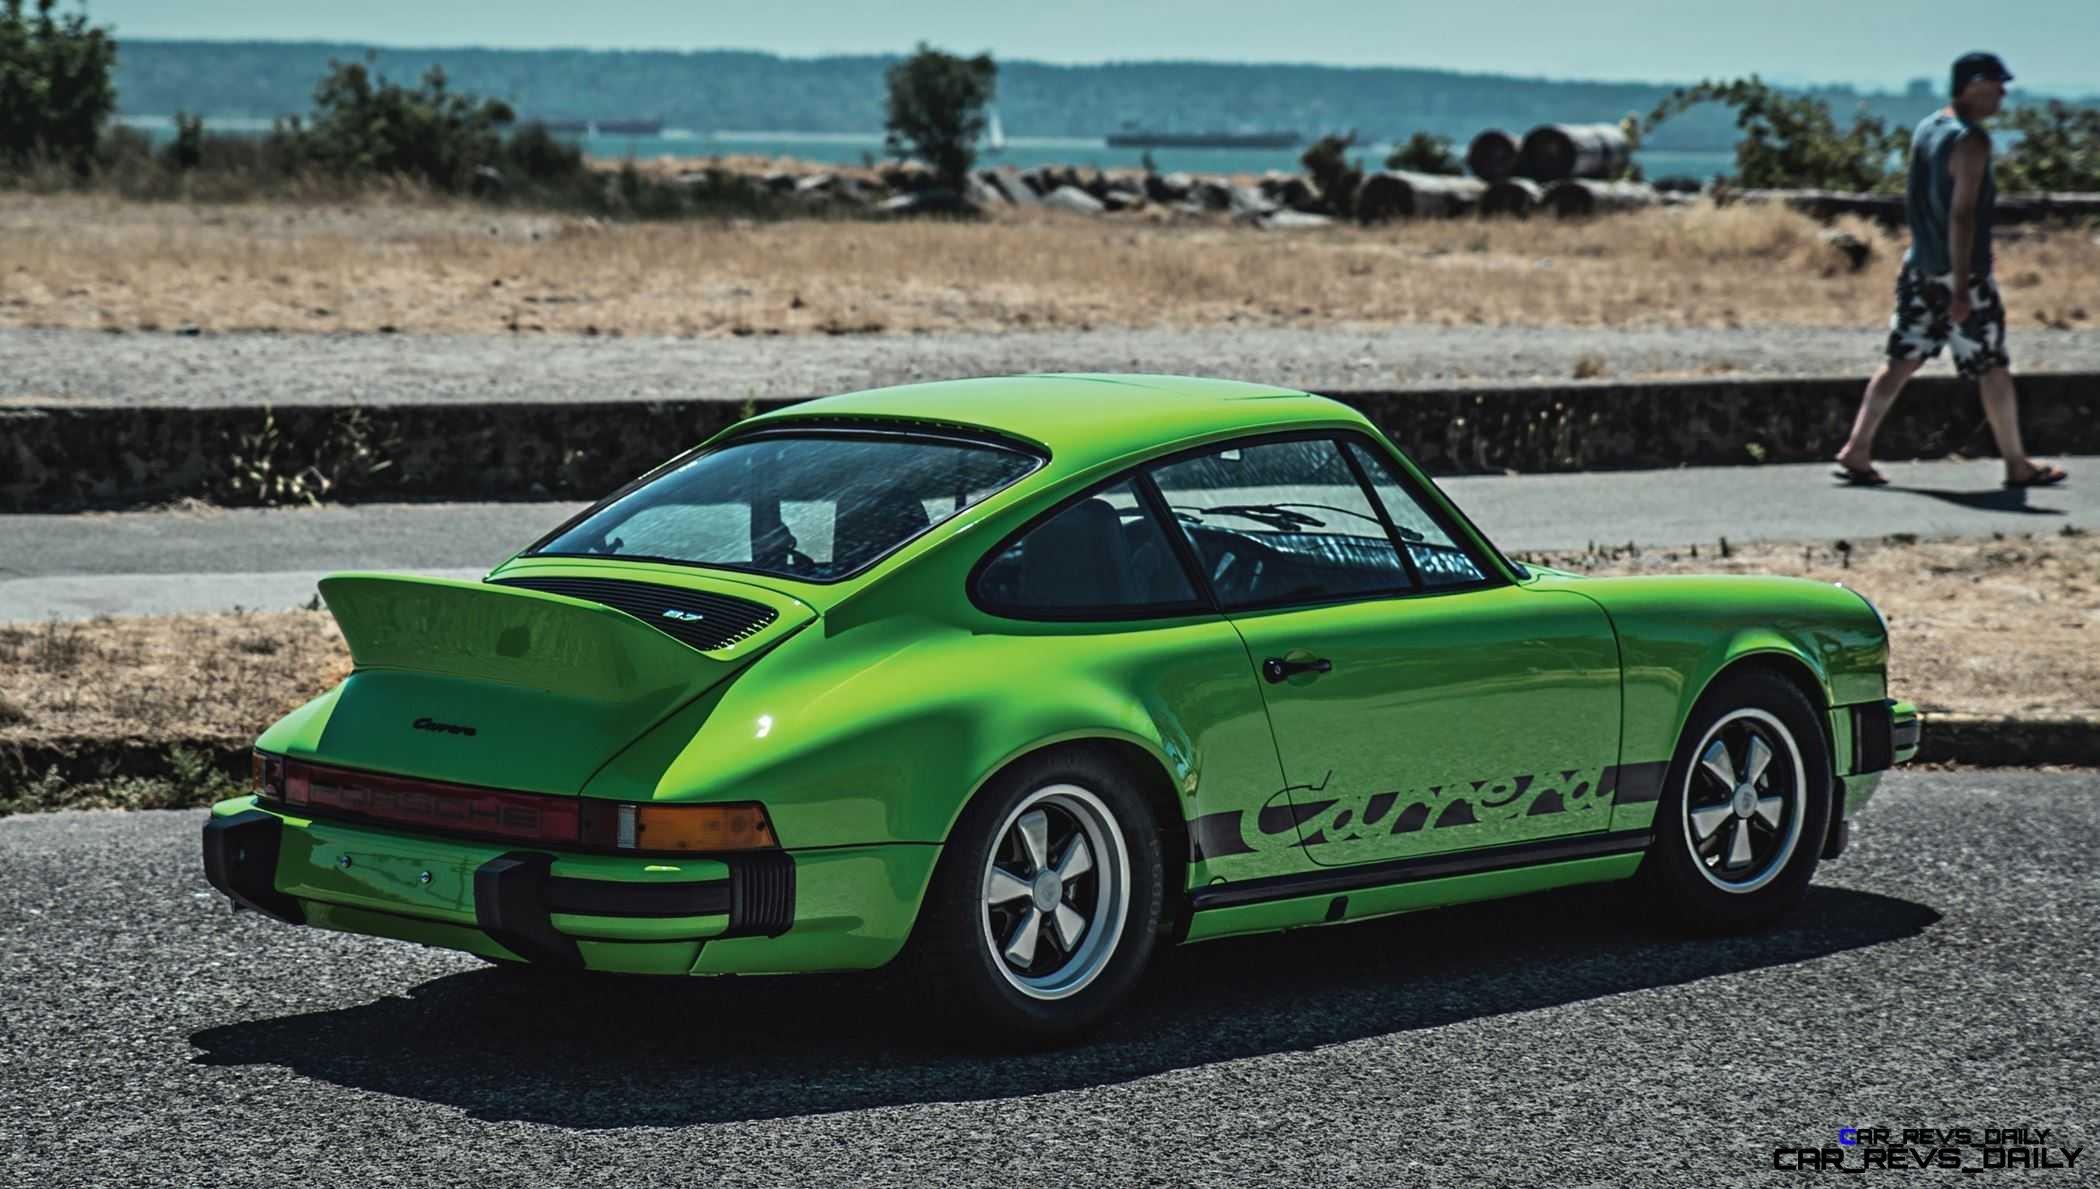 1974 Porsche 911 Carrera 2 7 Is Lime Green Dream For Rm